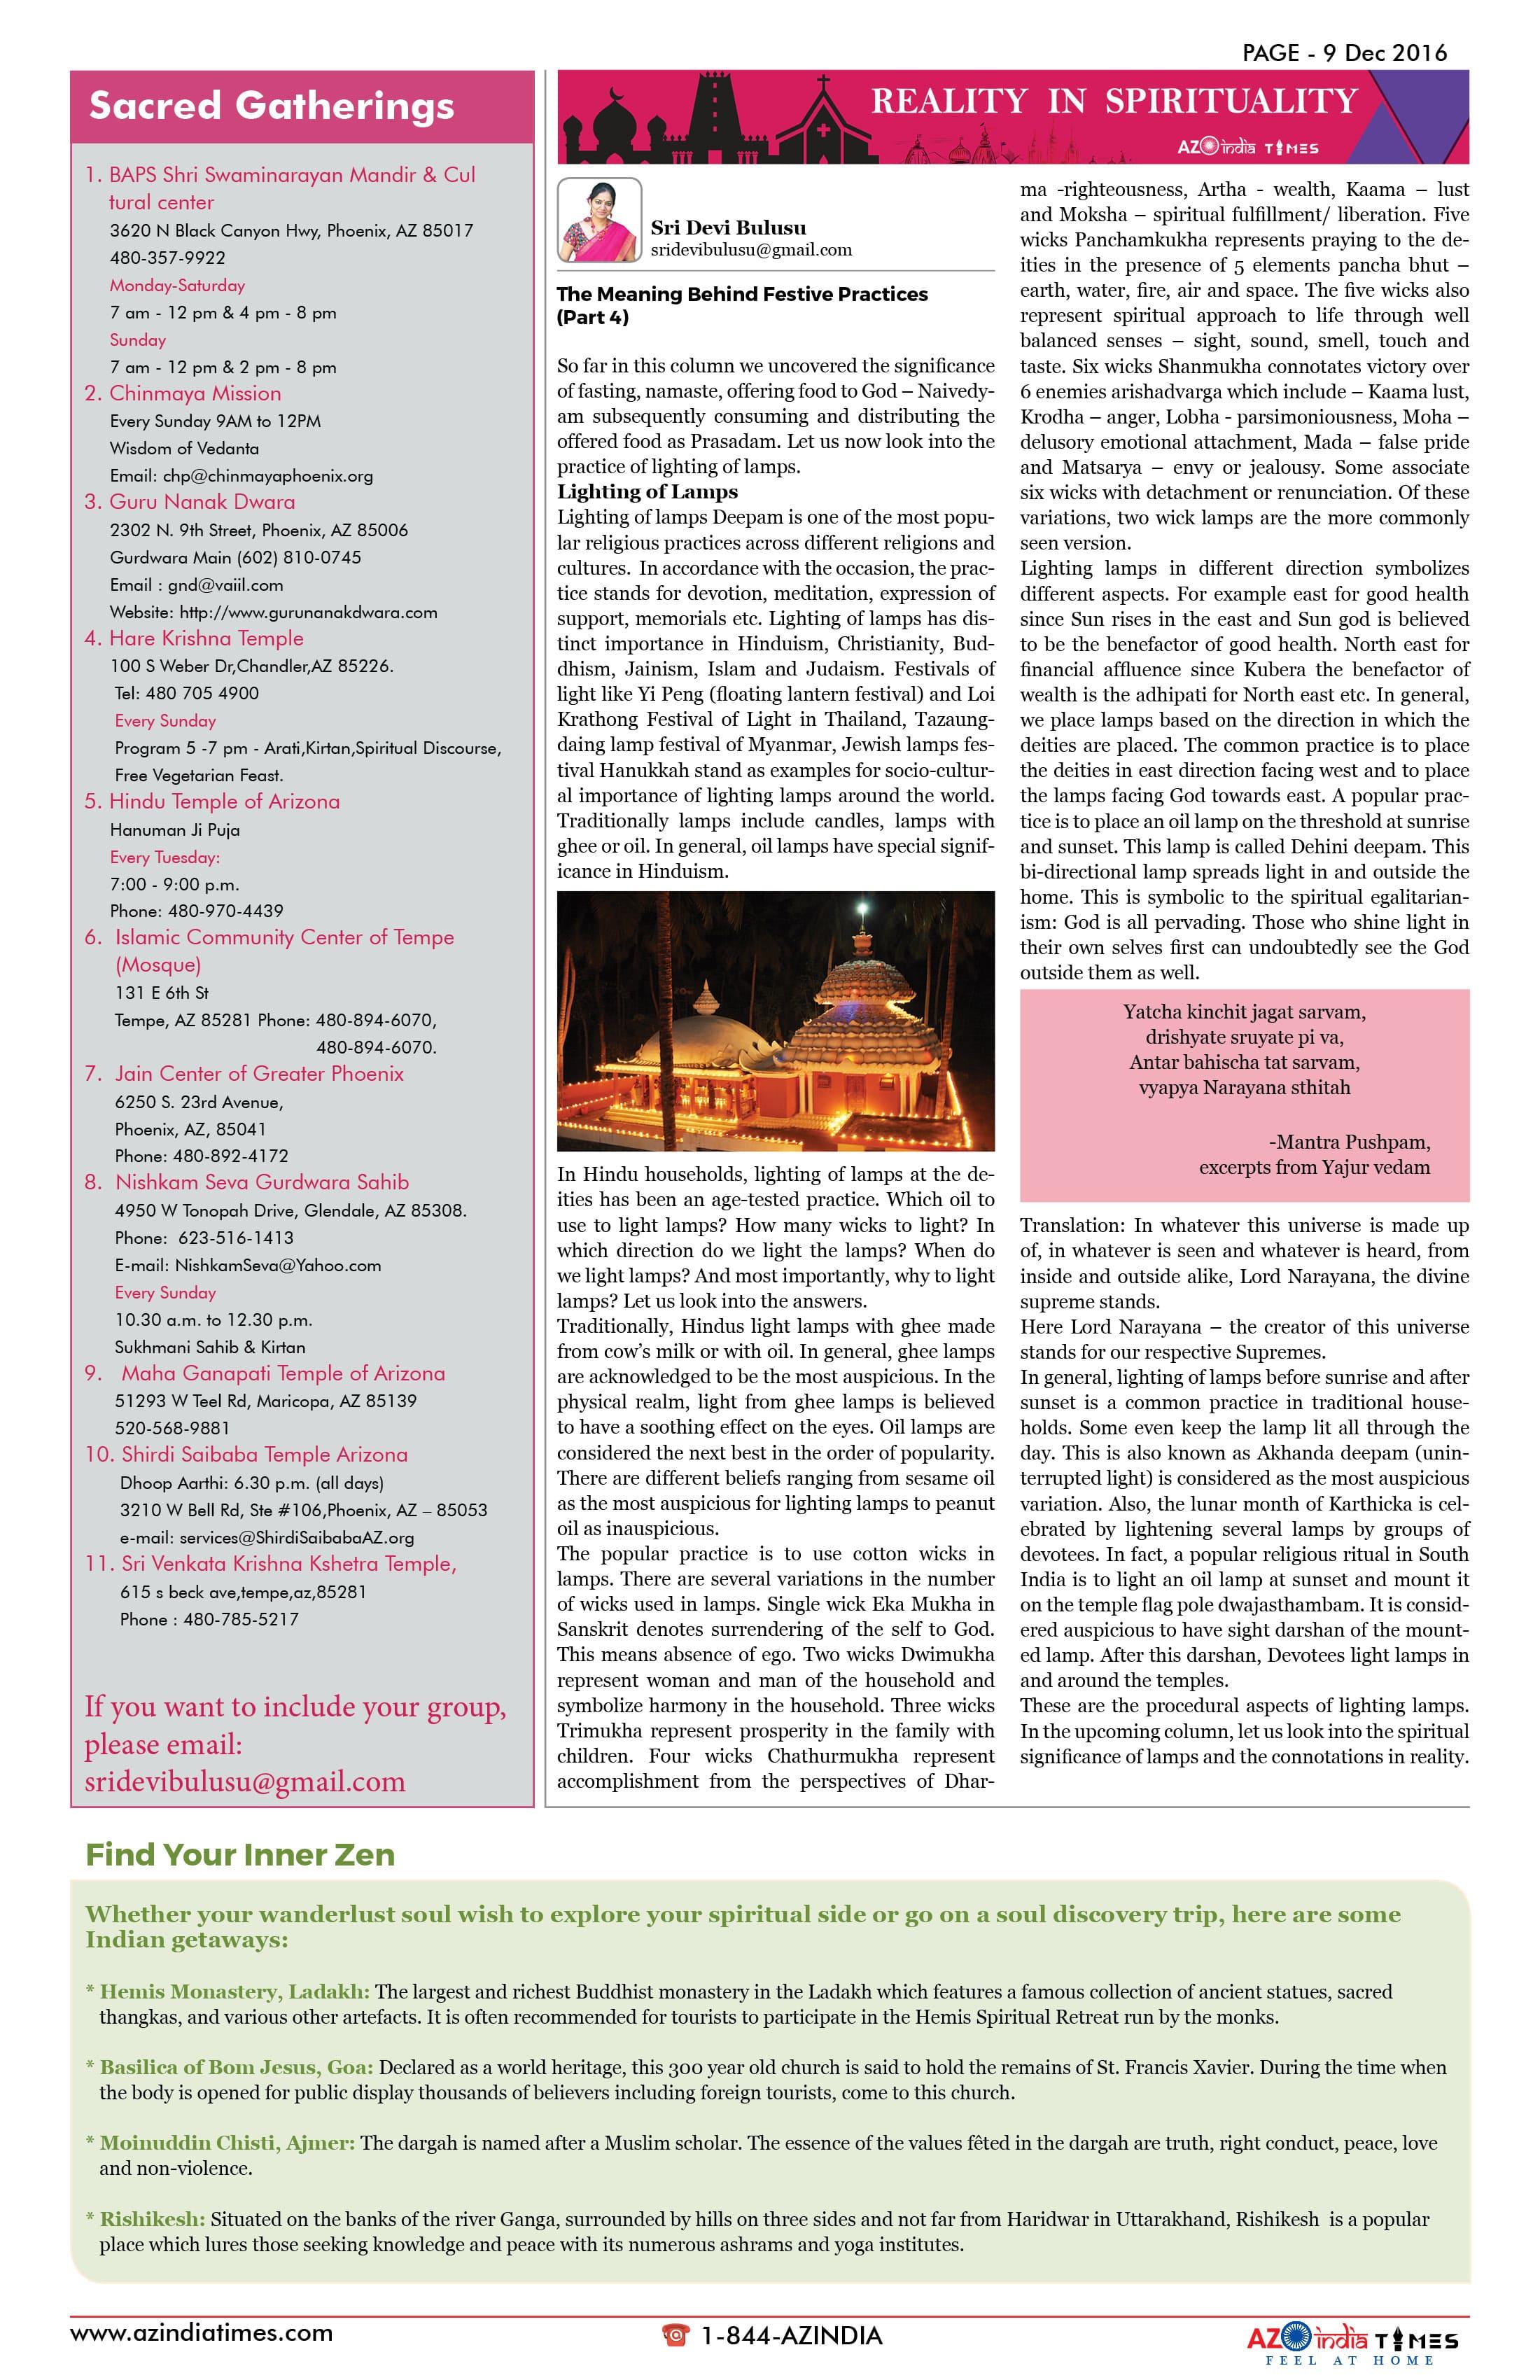 AZ INDIA DECEMBER EDITION 9